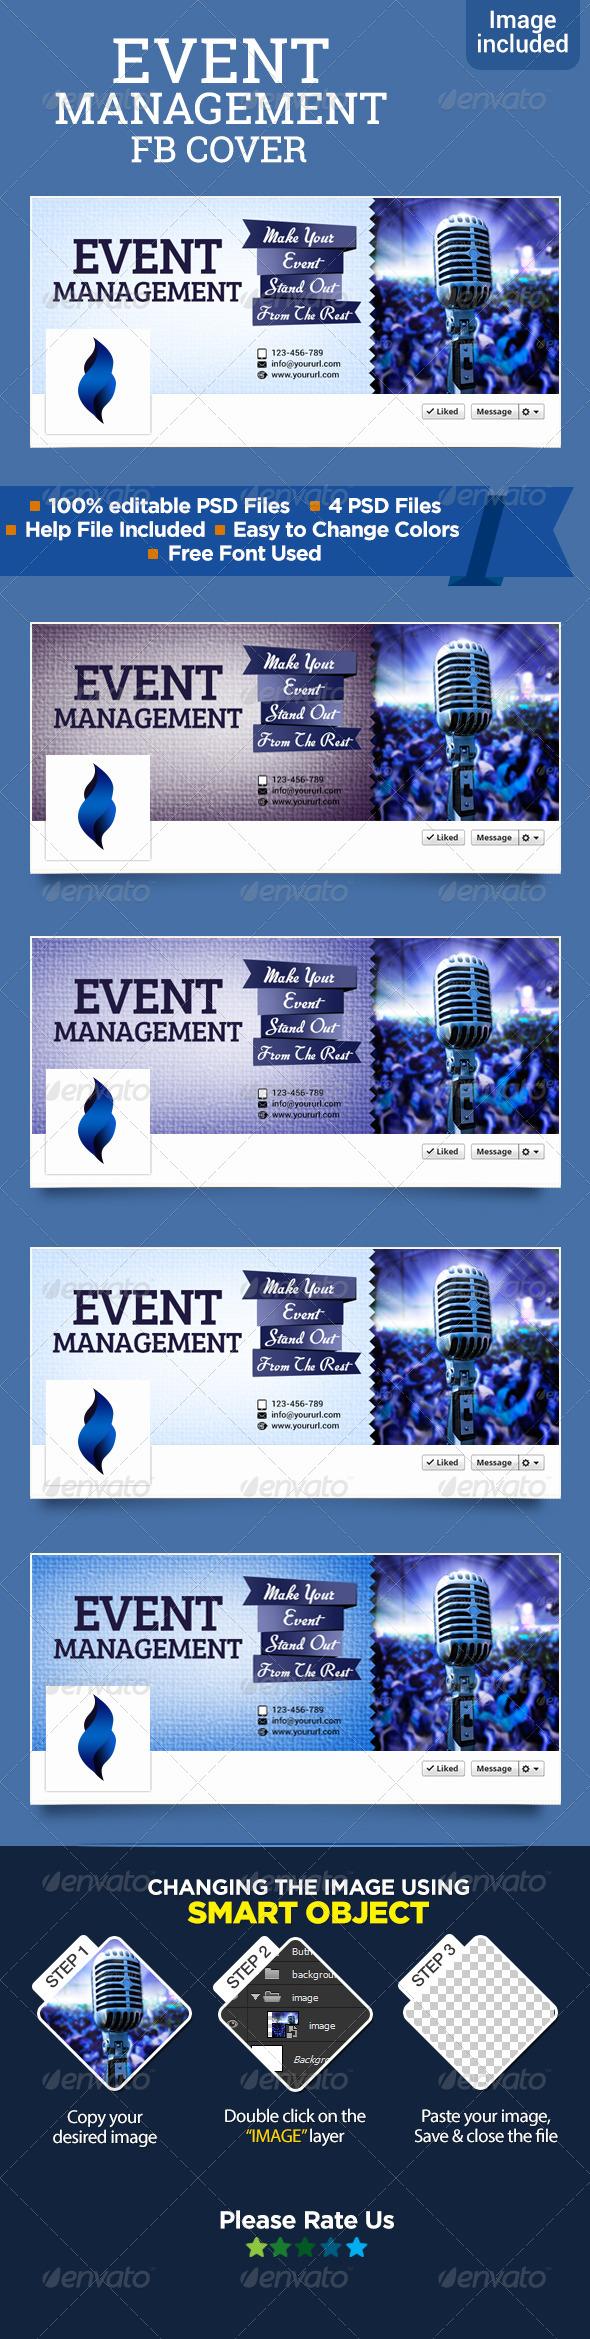 Event Management Facebook Cover - Facebook Timeline Covers Social Media